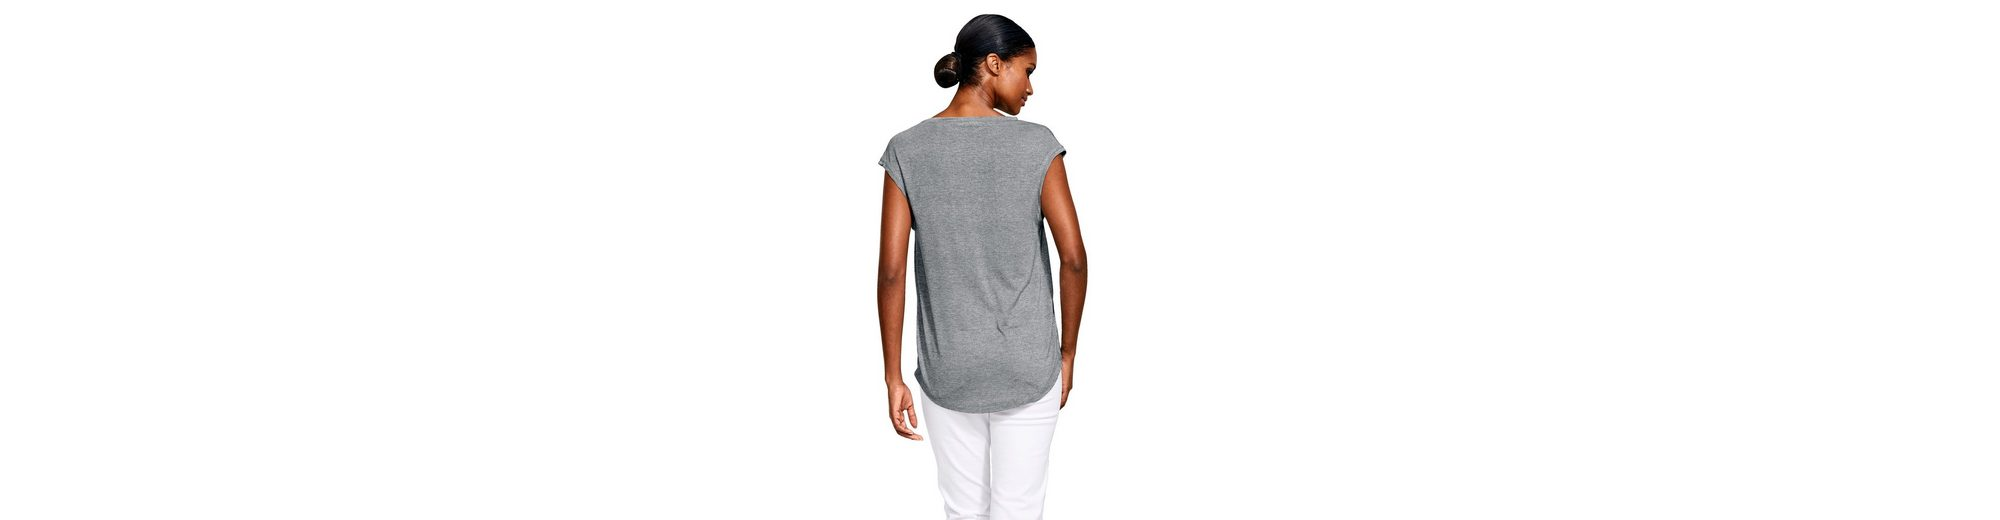 Alba Moda Shirt mit Rosenprint Auslass Günstiger Preis 2018 Günstiger Preis zATf9JDY